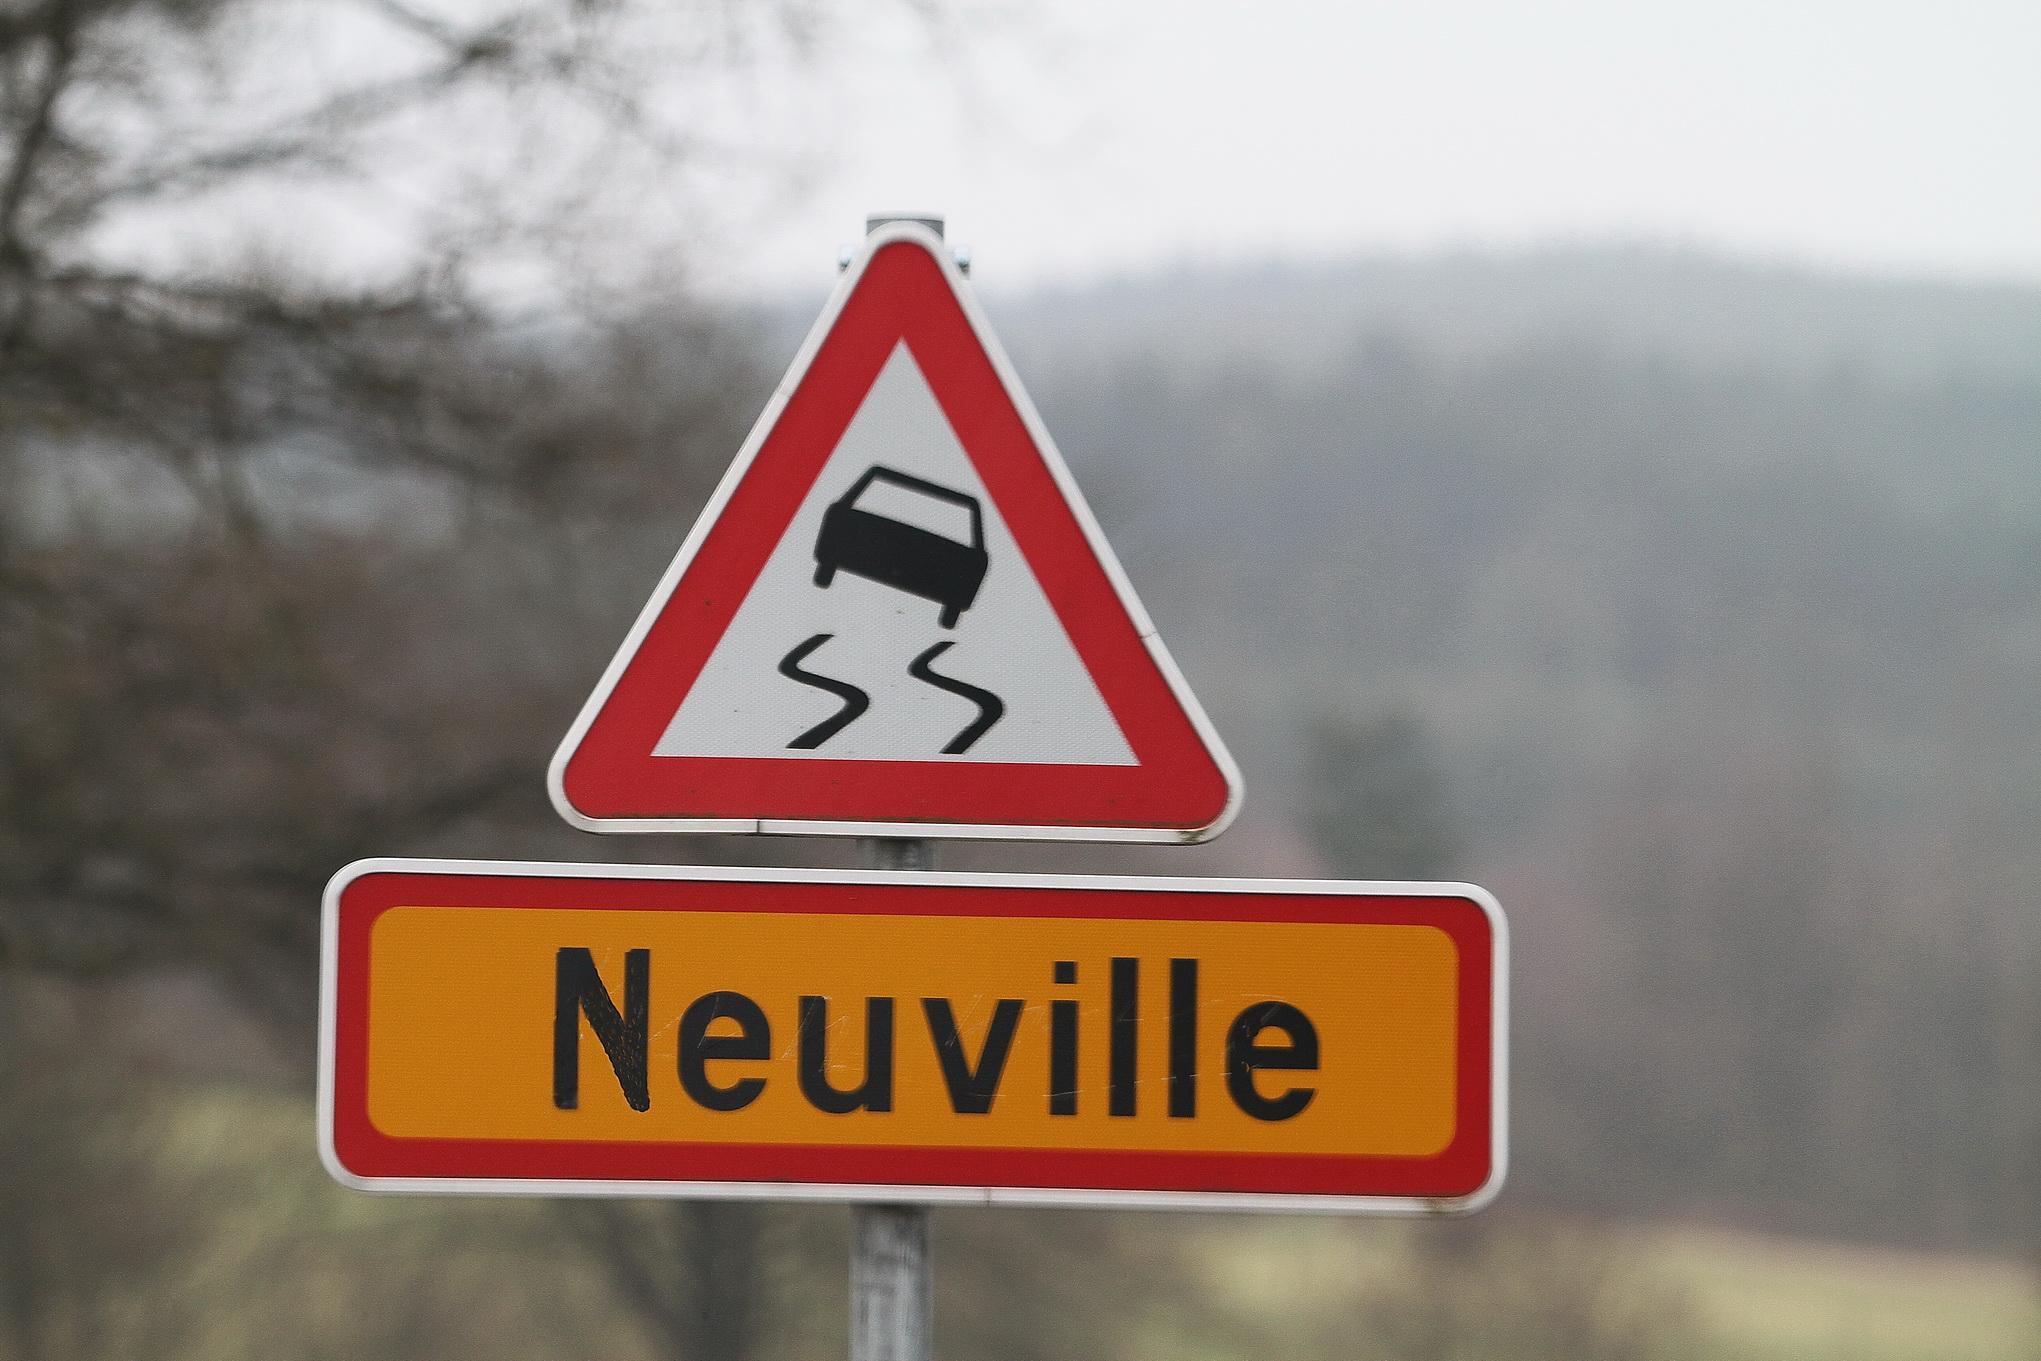 NEUVILLE chez FORD,virage dangereux ou virage tout court.© Manfred GIET por autonewsinfo